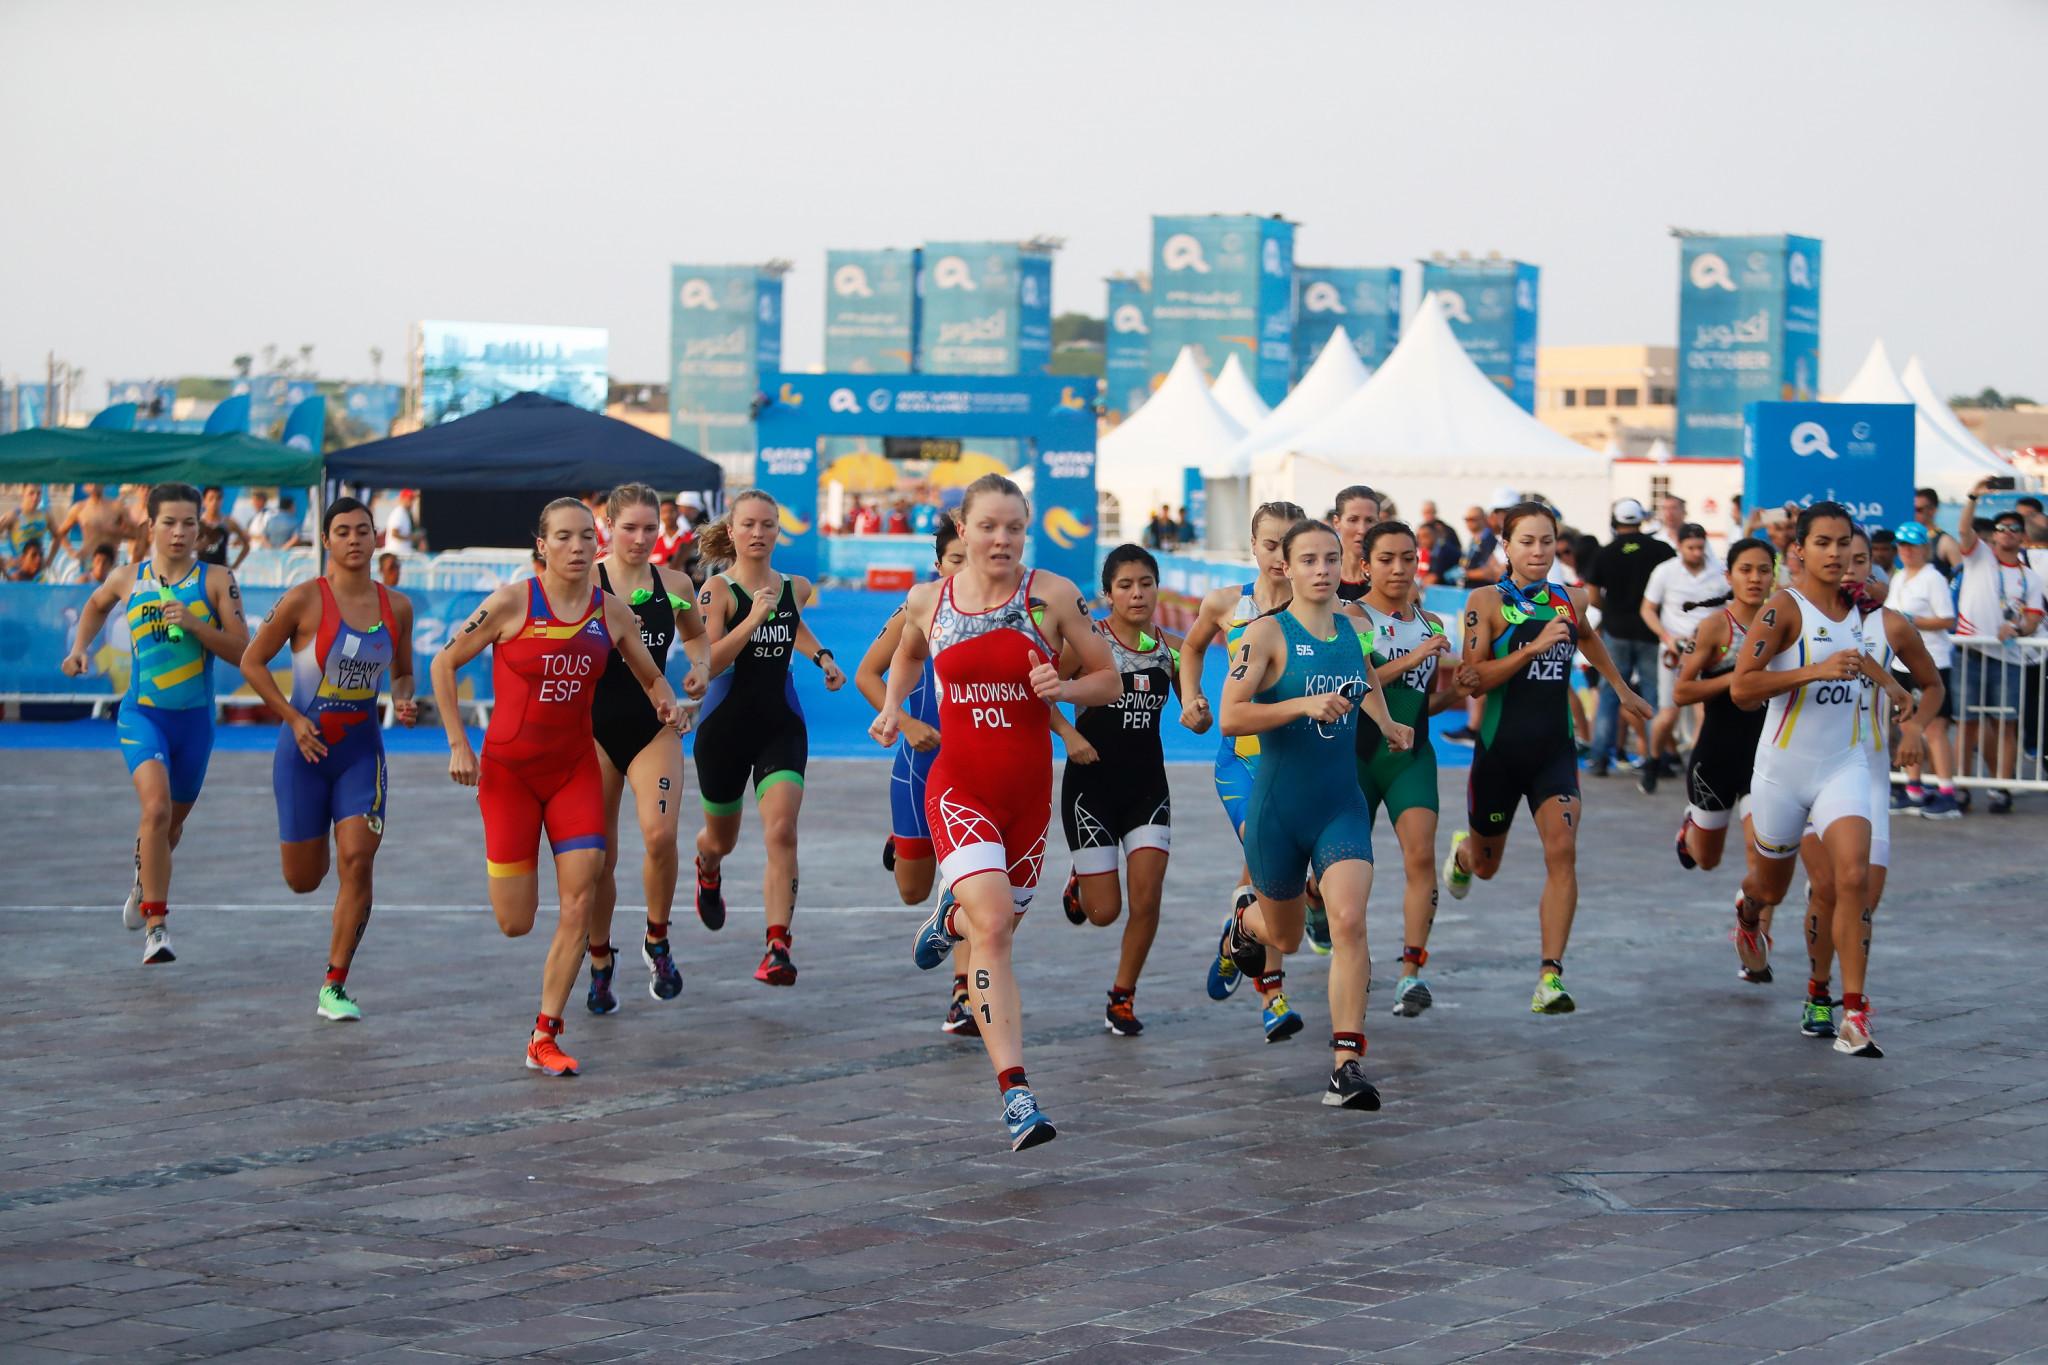 The aquathlon features a run-swim-run format ©ANOC